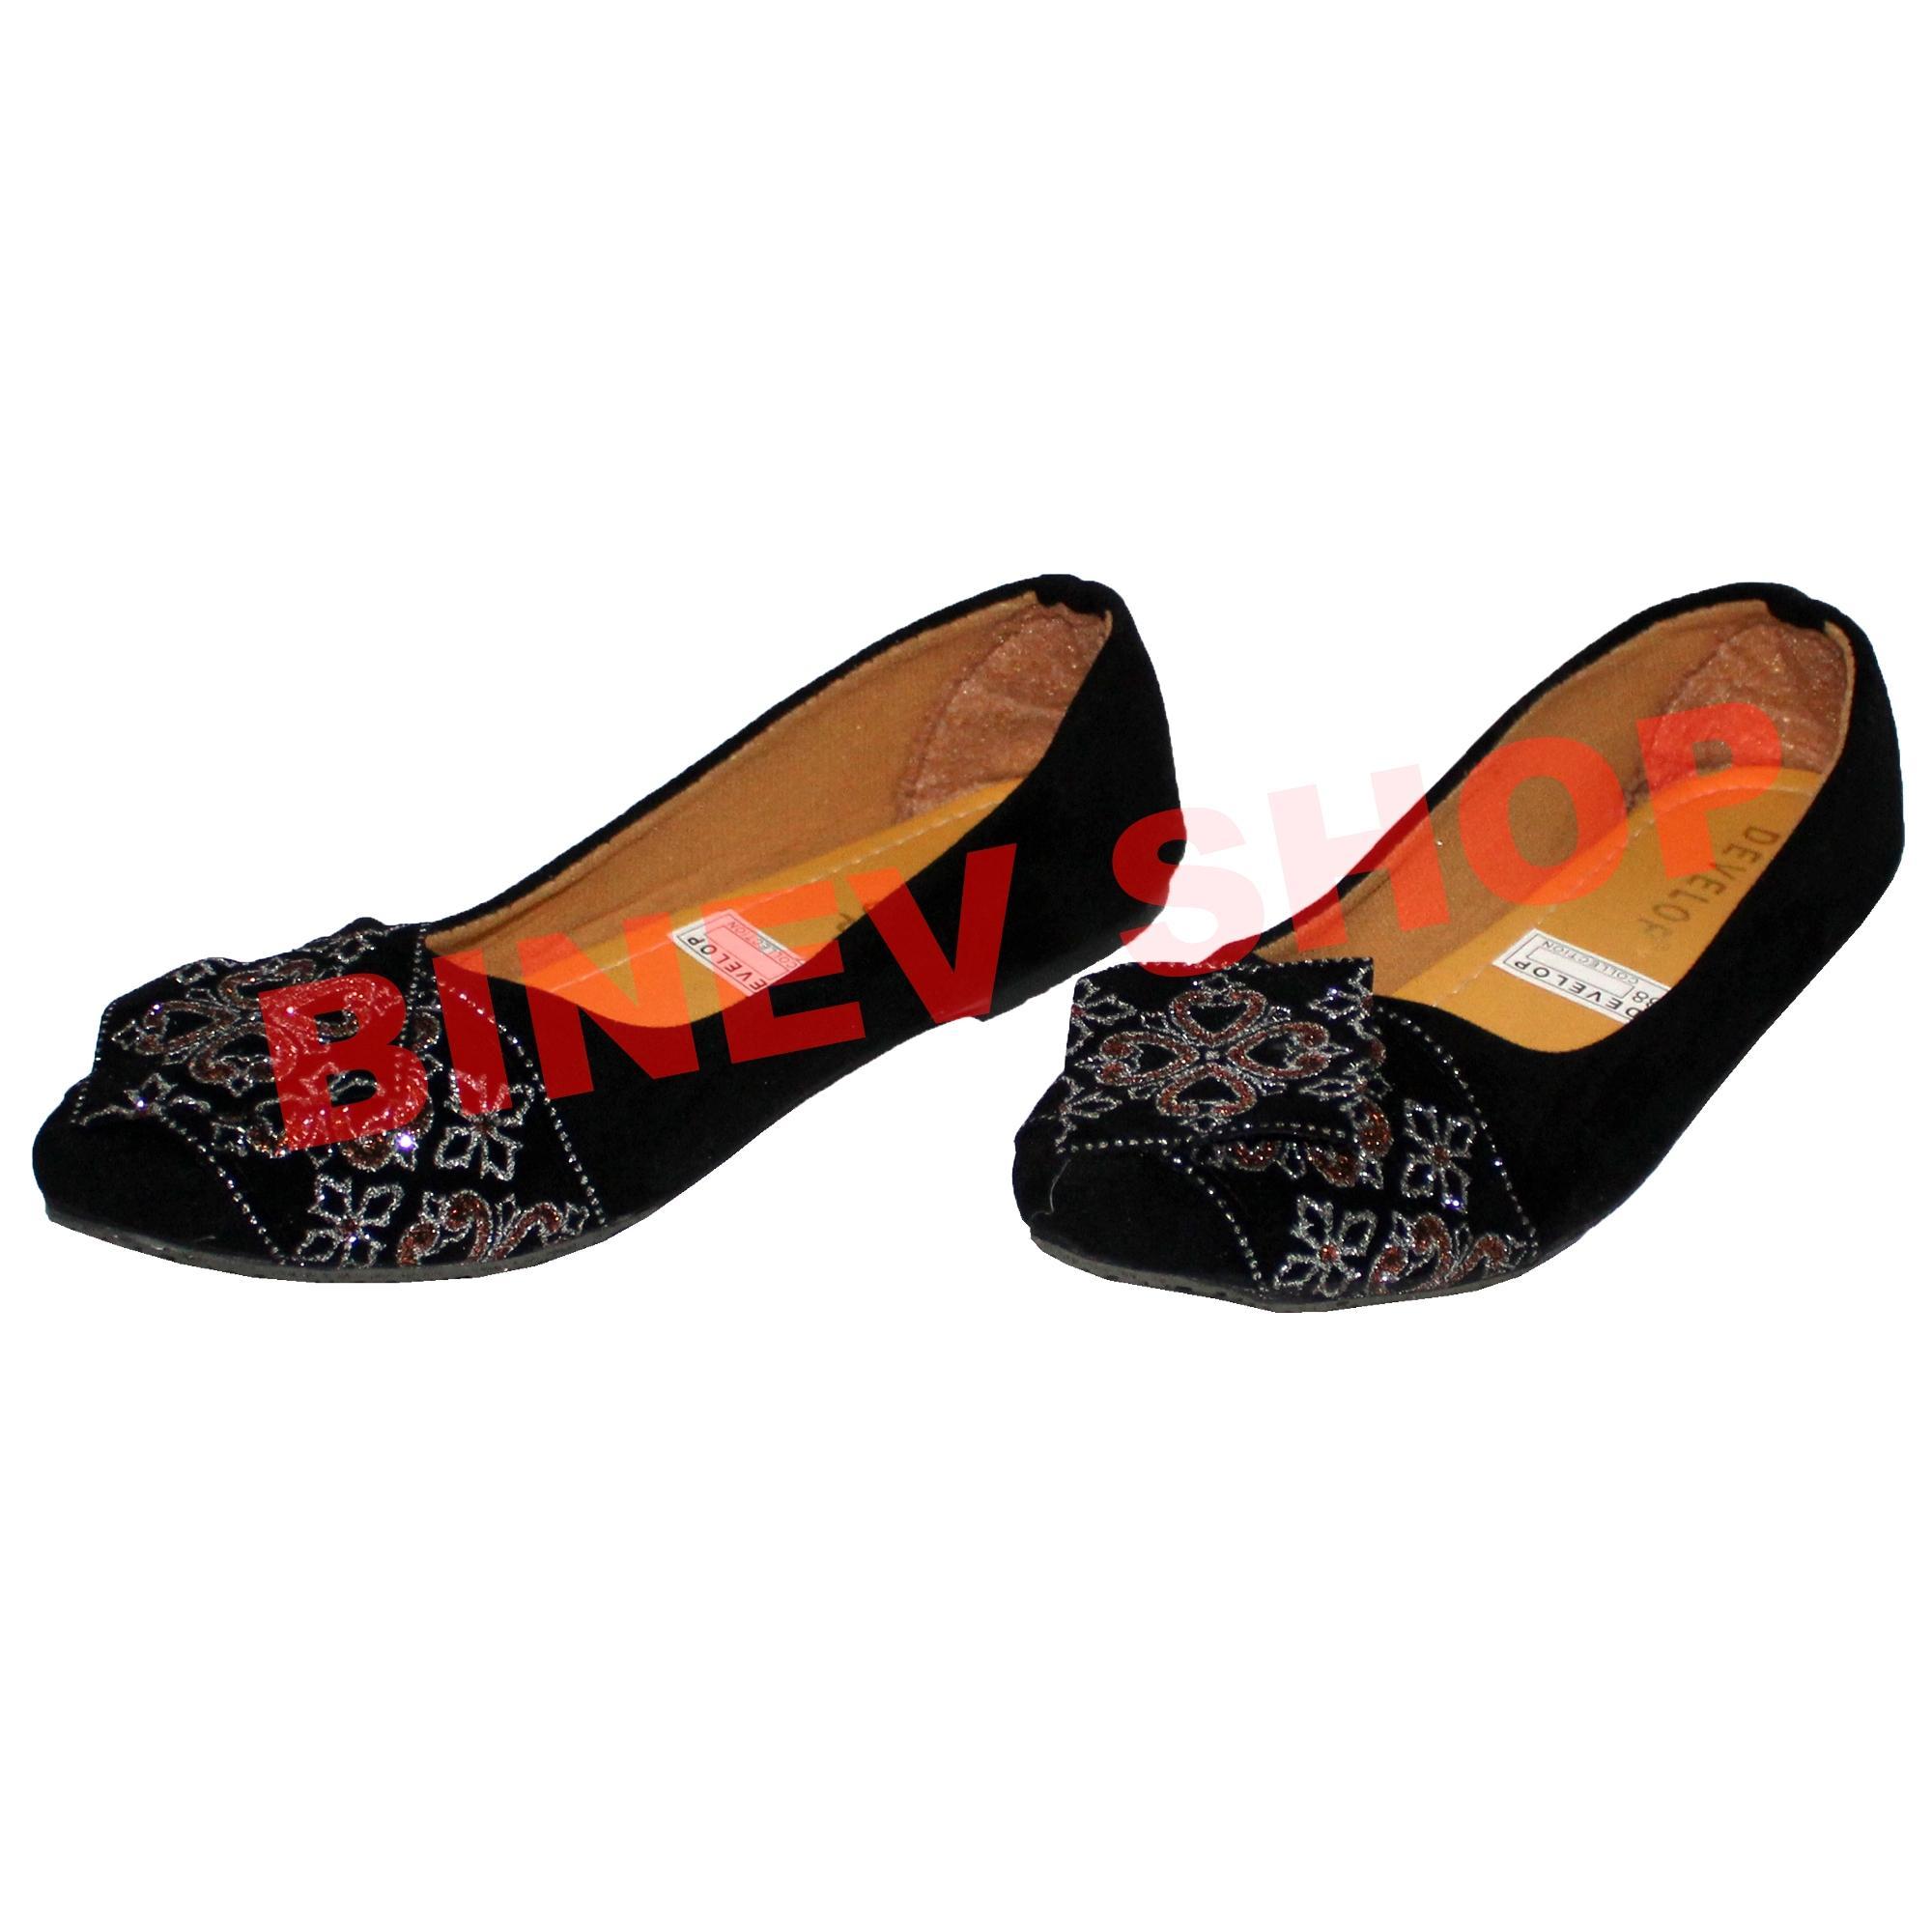 Binev Sepatu Slip On Wanita 36 - 3 .